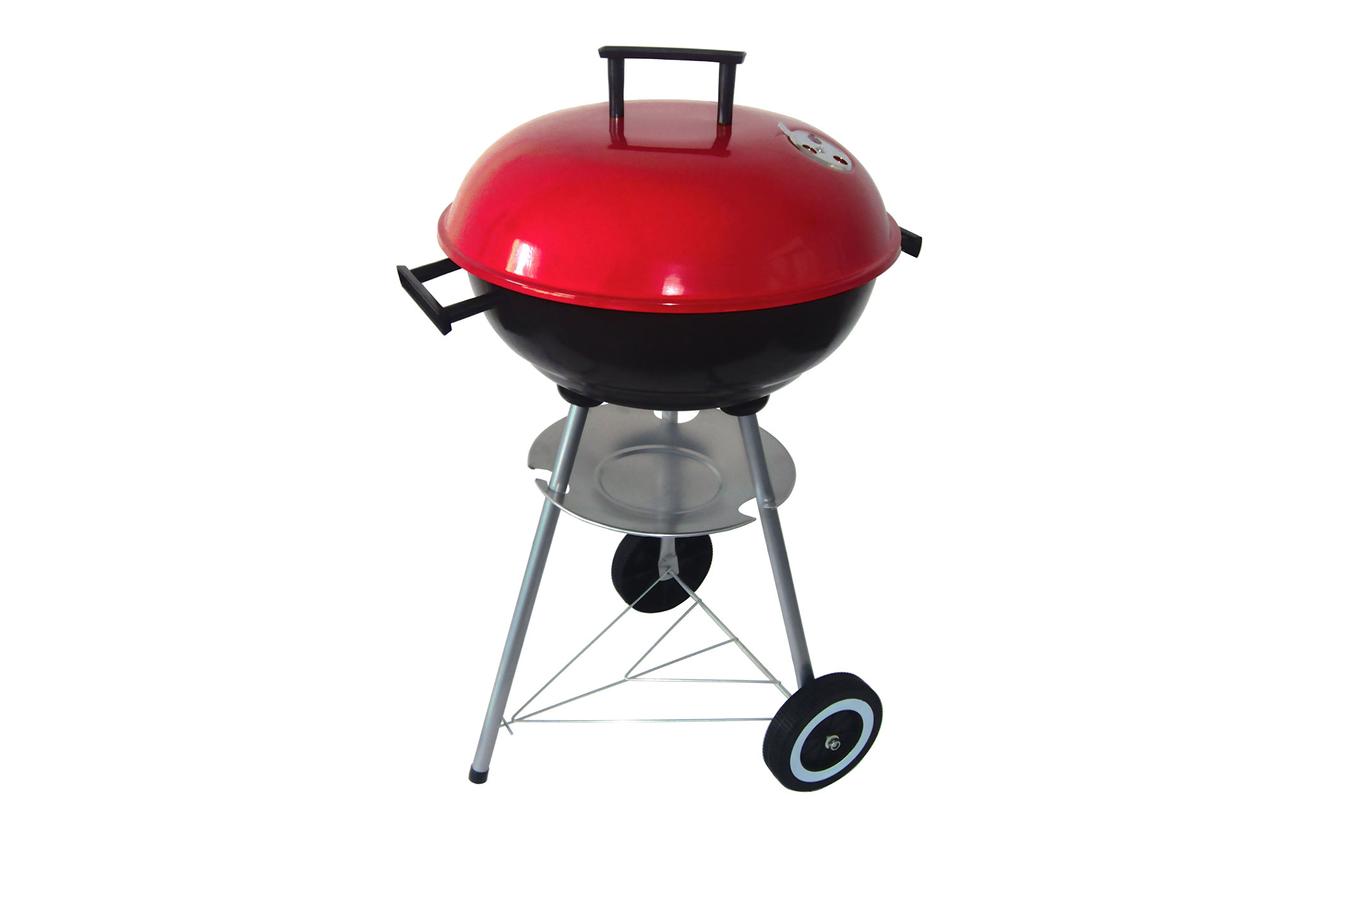 Barbecue proline sunny 2 sunny2 1369962 darty - Darty barbecue electrique ...